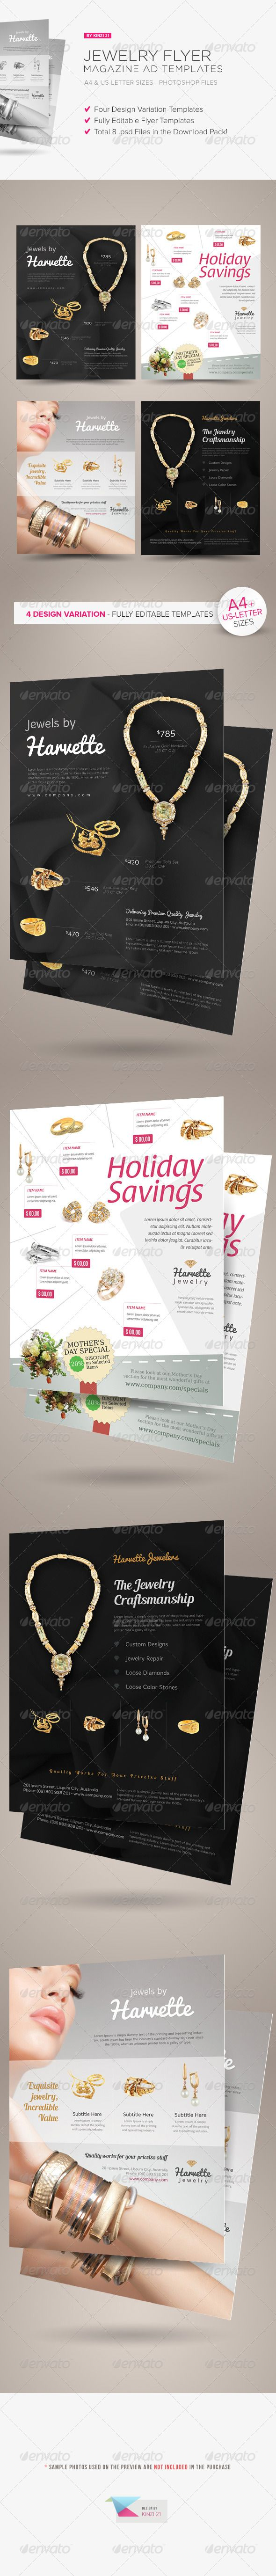 jewelry flyer or magazine ad templates flyer templates pinterest